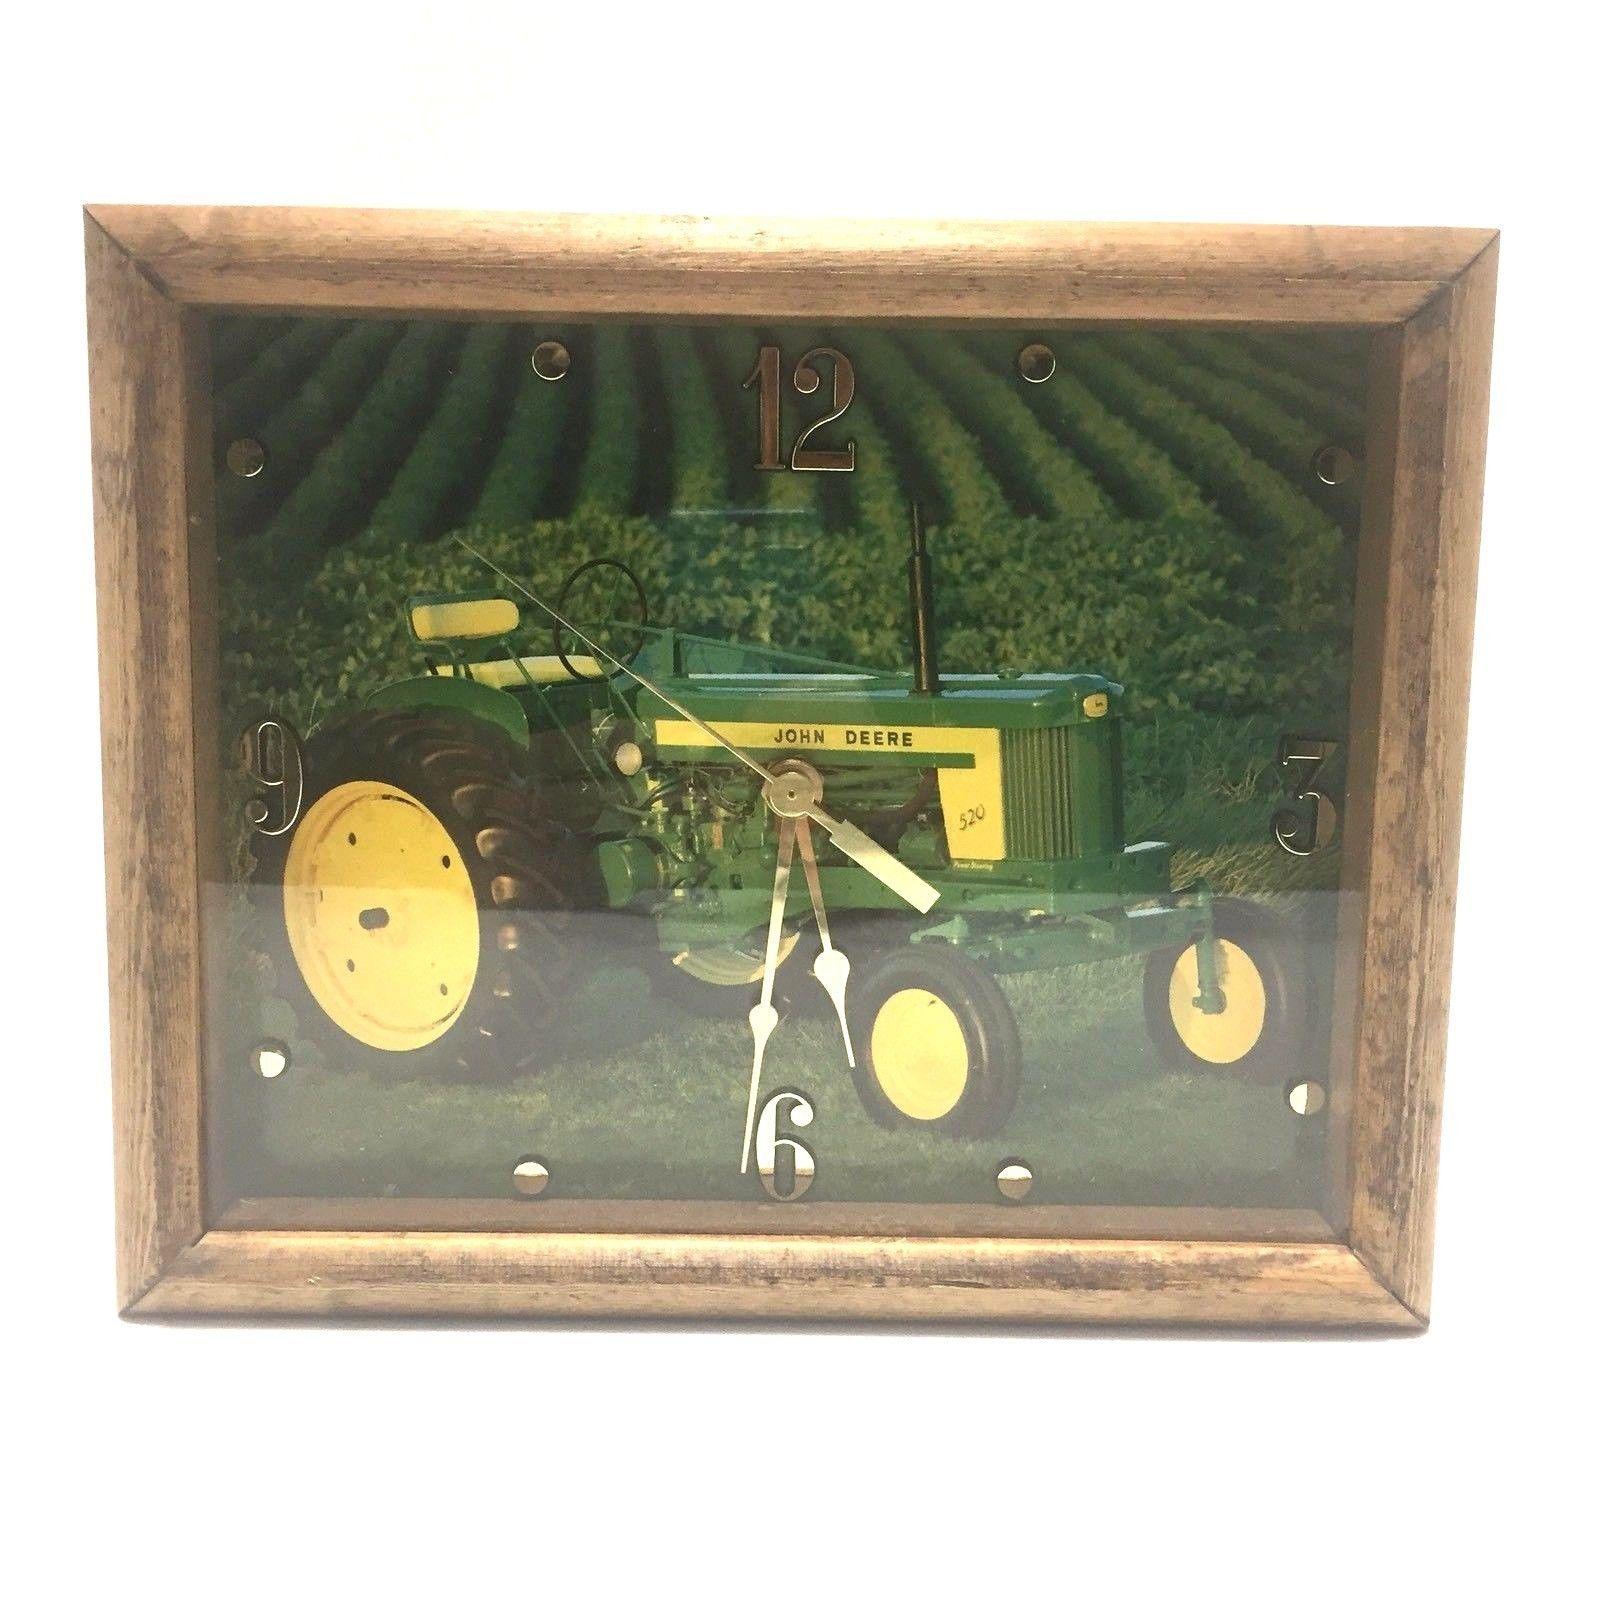 John deere 520 tractor wall clock custom made wood frame usa 9x11 john deere 520 tractor wall clock custom made wood frame usa 9x11 ebay jeuxipadfo Images